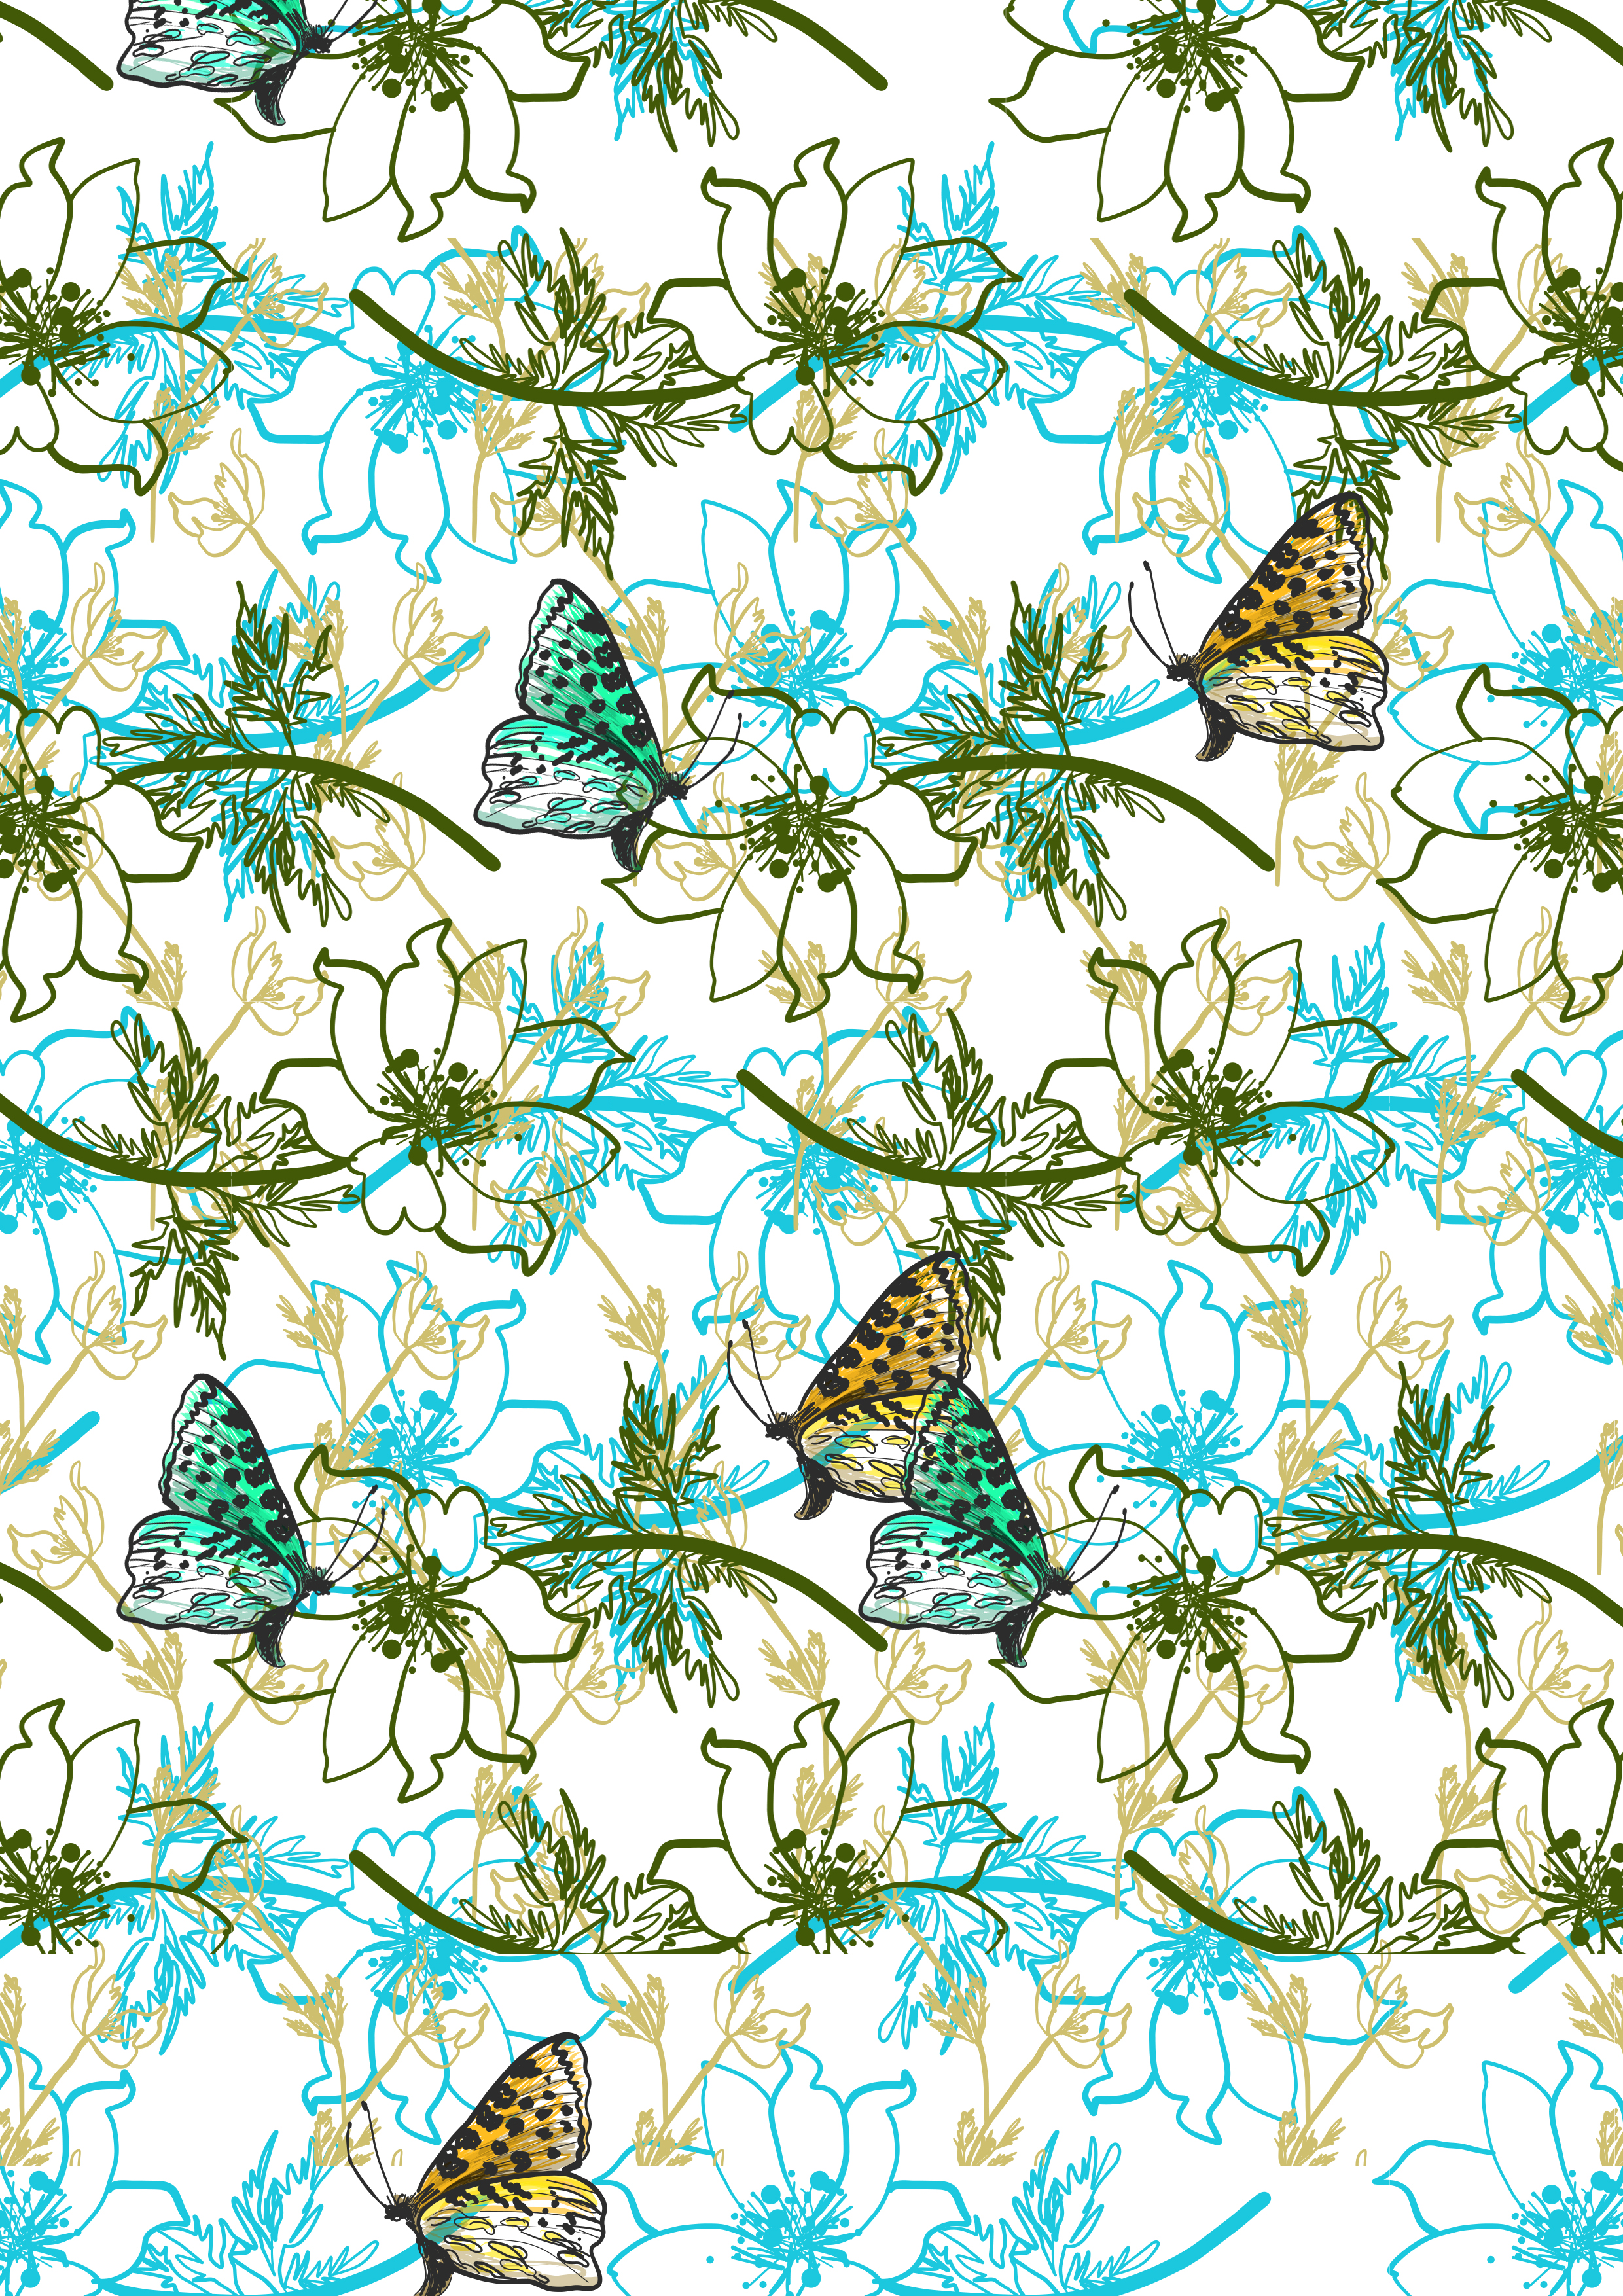 anemoneetpapillons